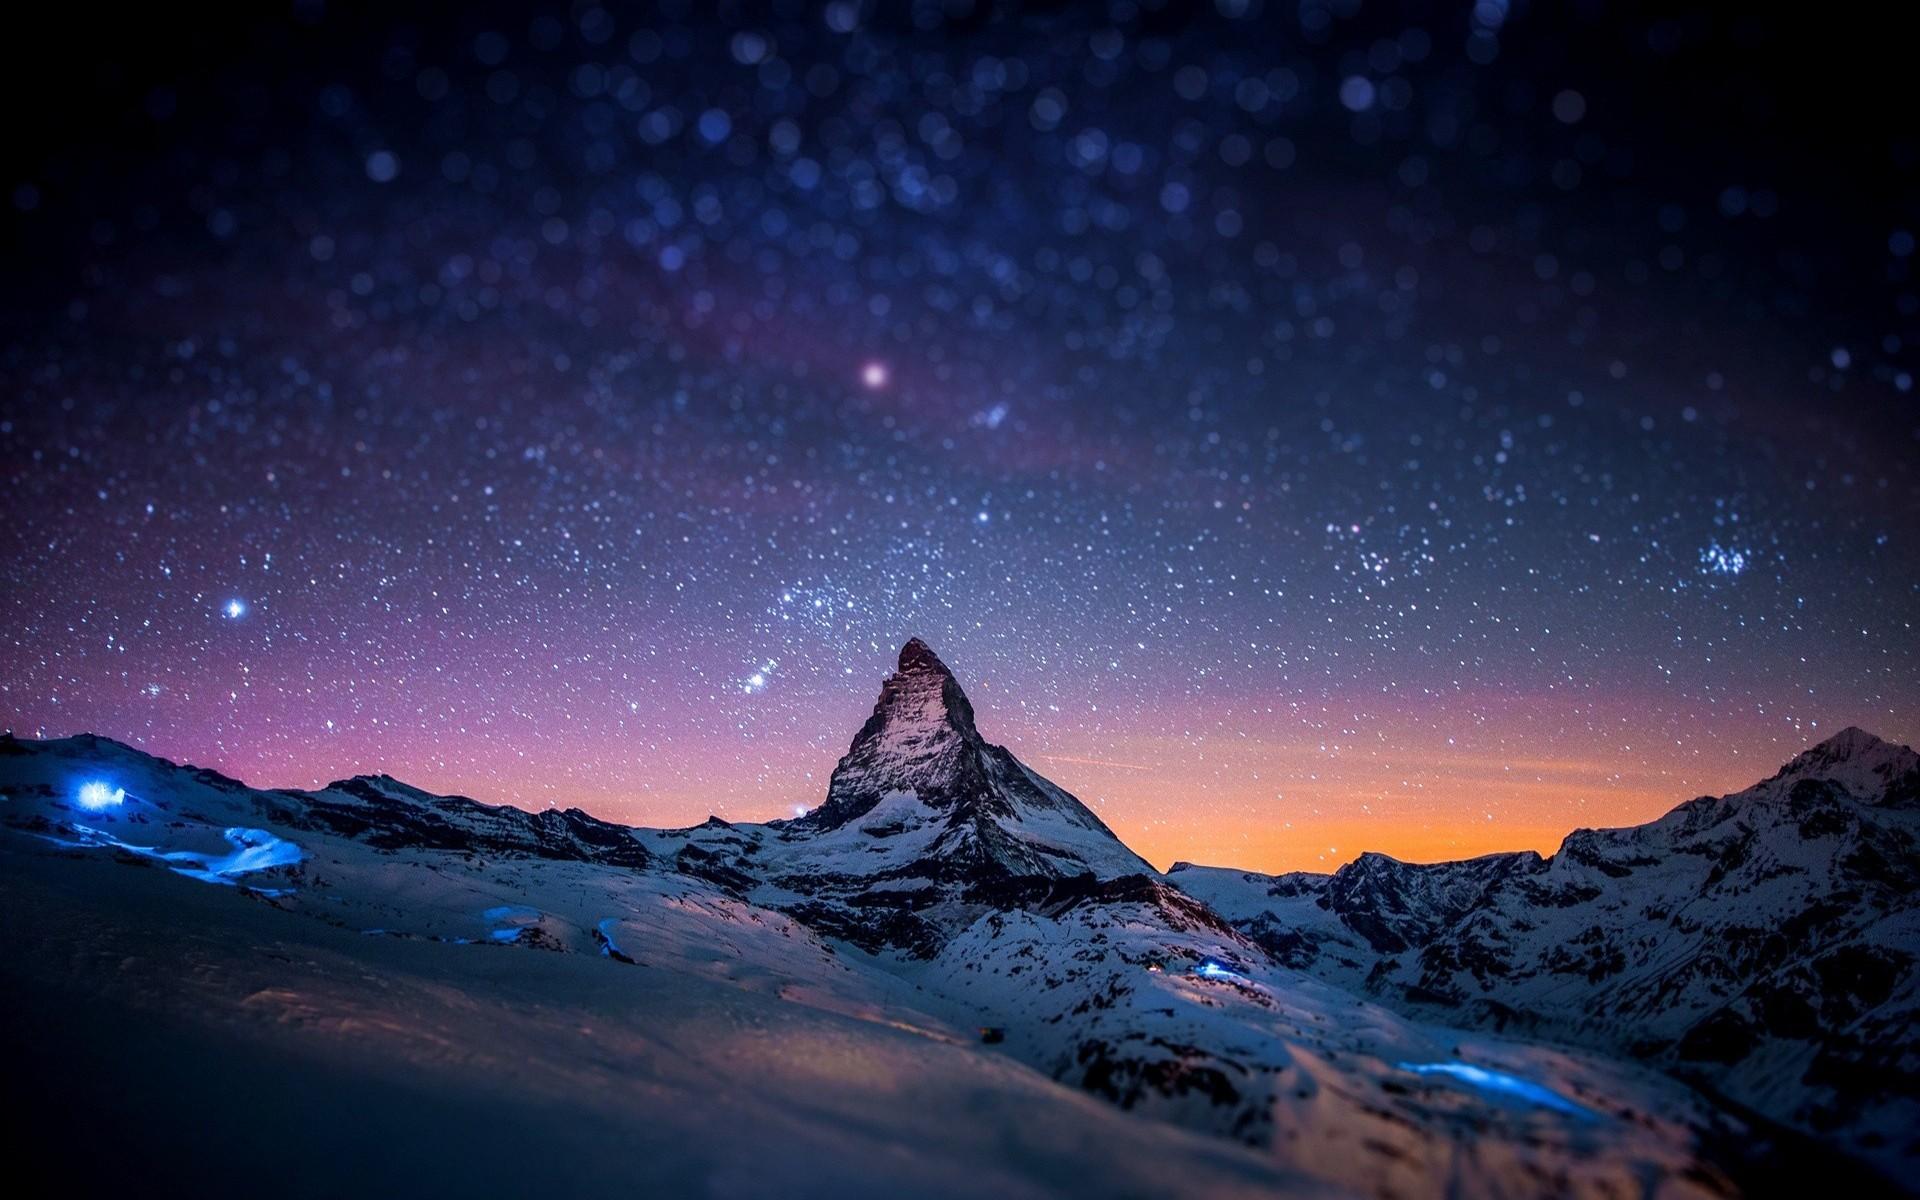 Fondo De Pantalla Paisaje Montañas Nevada: Fondos De Pantalla : Paisaje, Montañas, Noche, Naturaleza